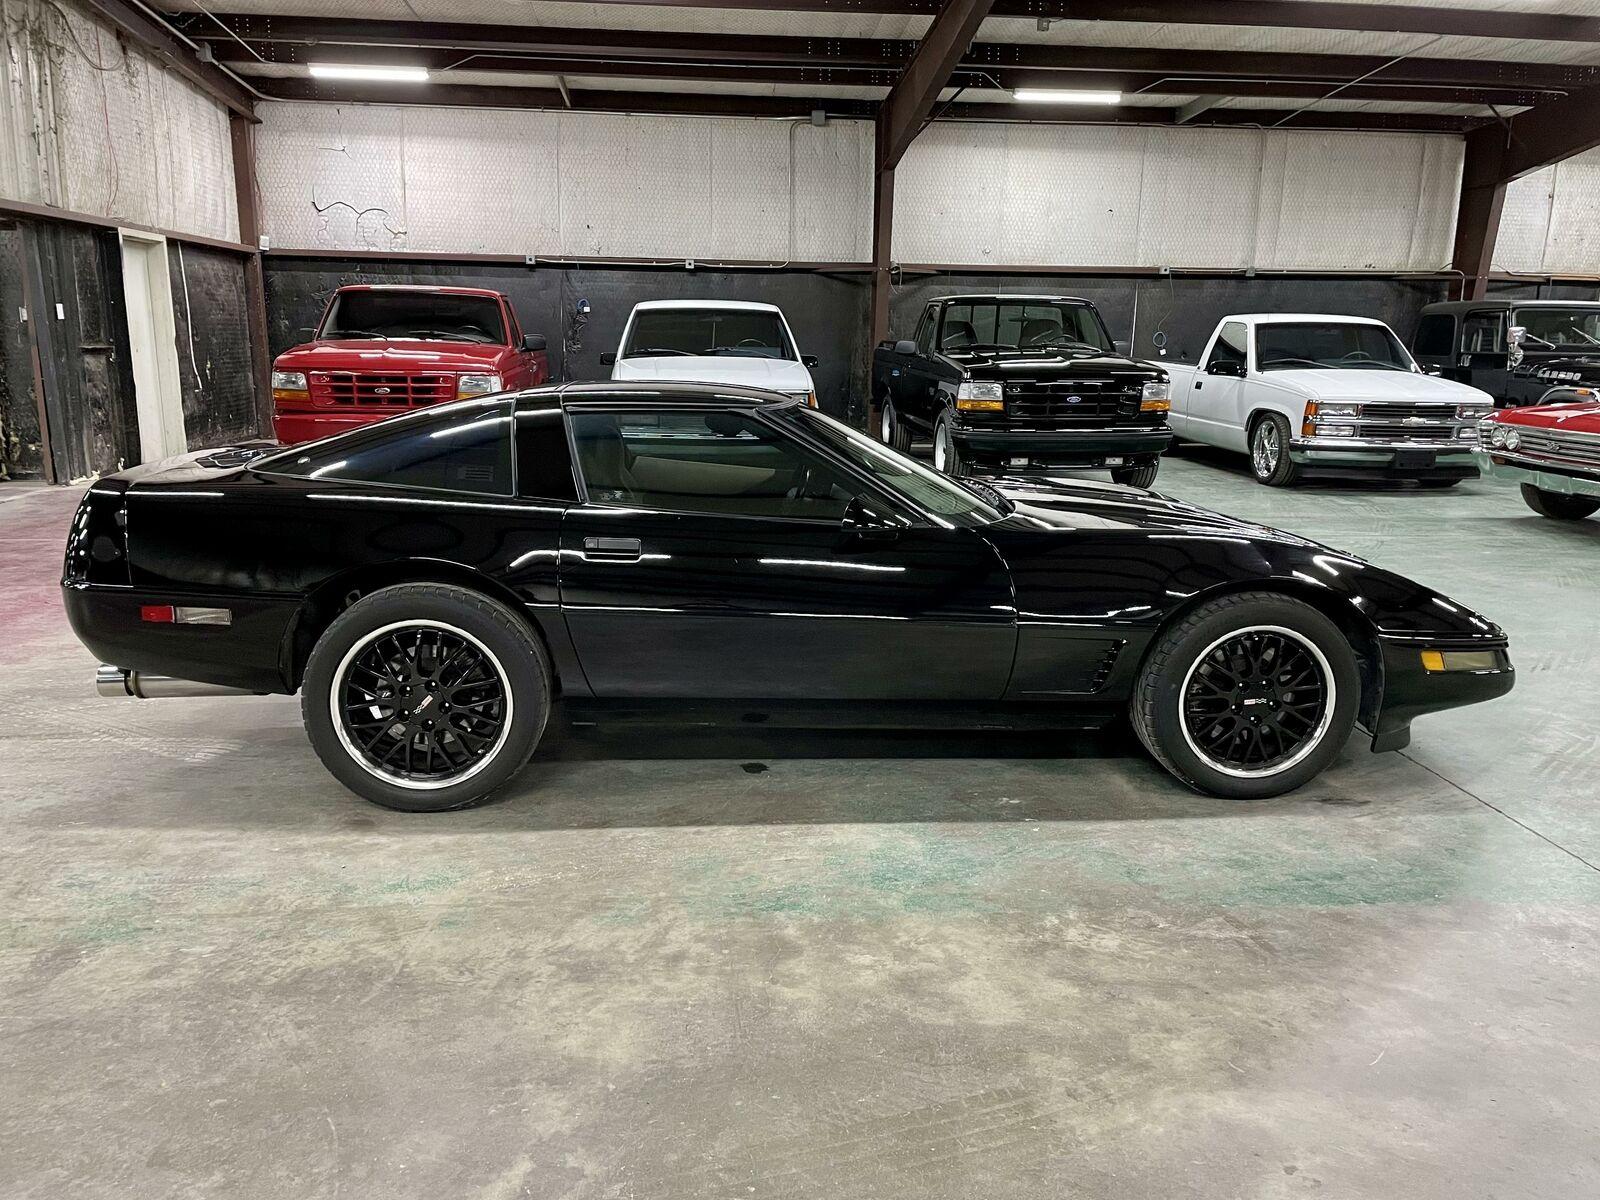 1996 Black Chevrolet Corvette     C4 Corvette Photo 6